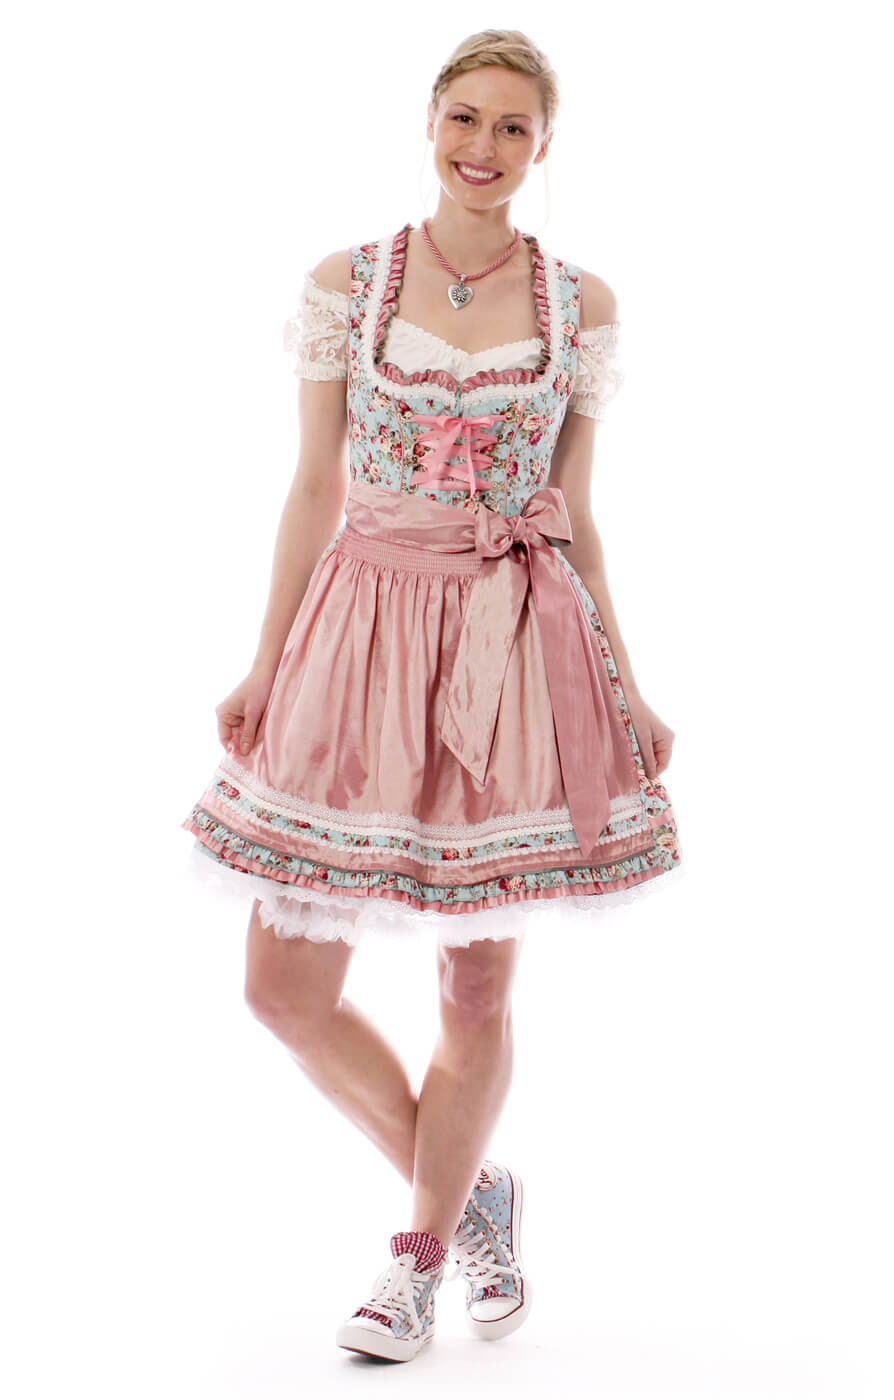 bavarian styles for hot summer days  oktoberfest dirndl